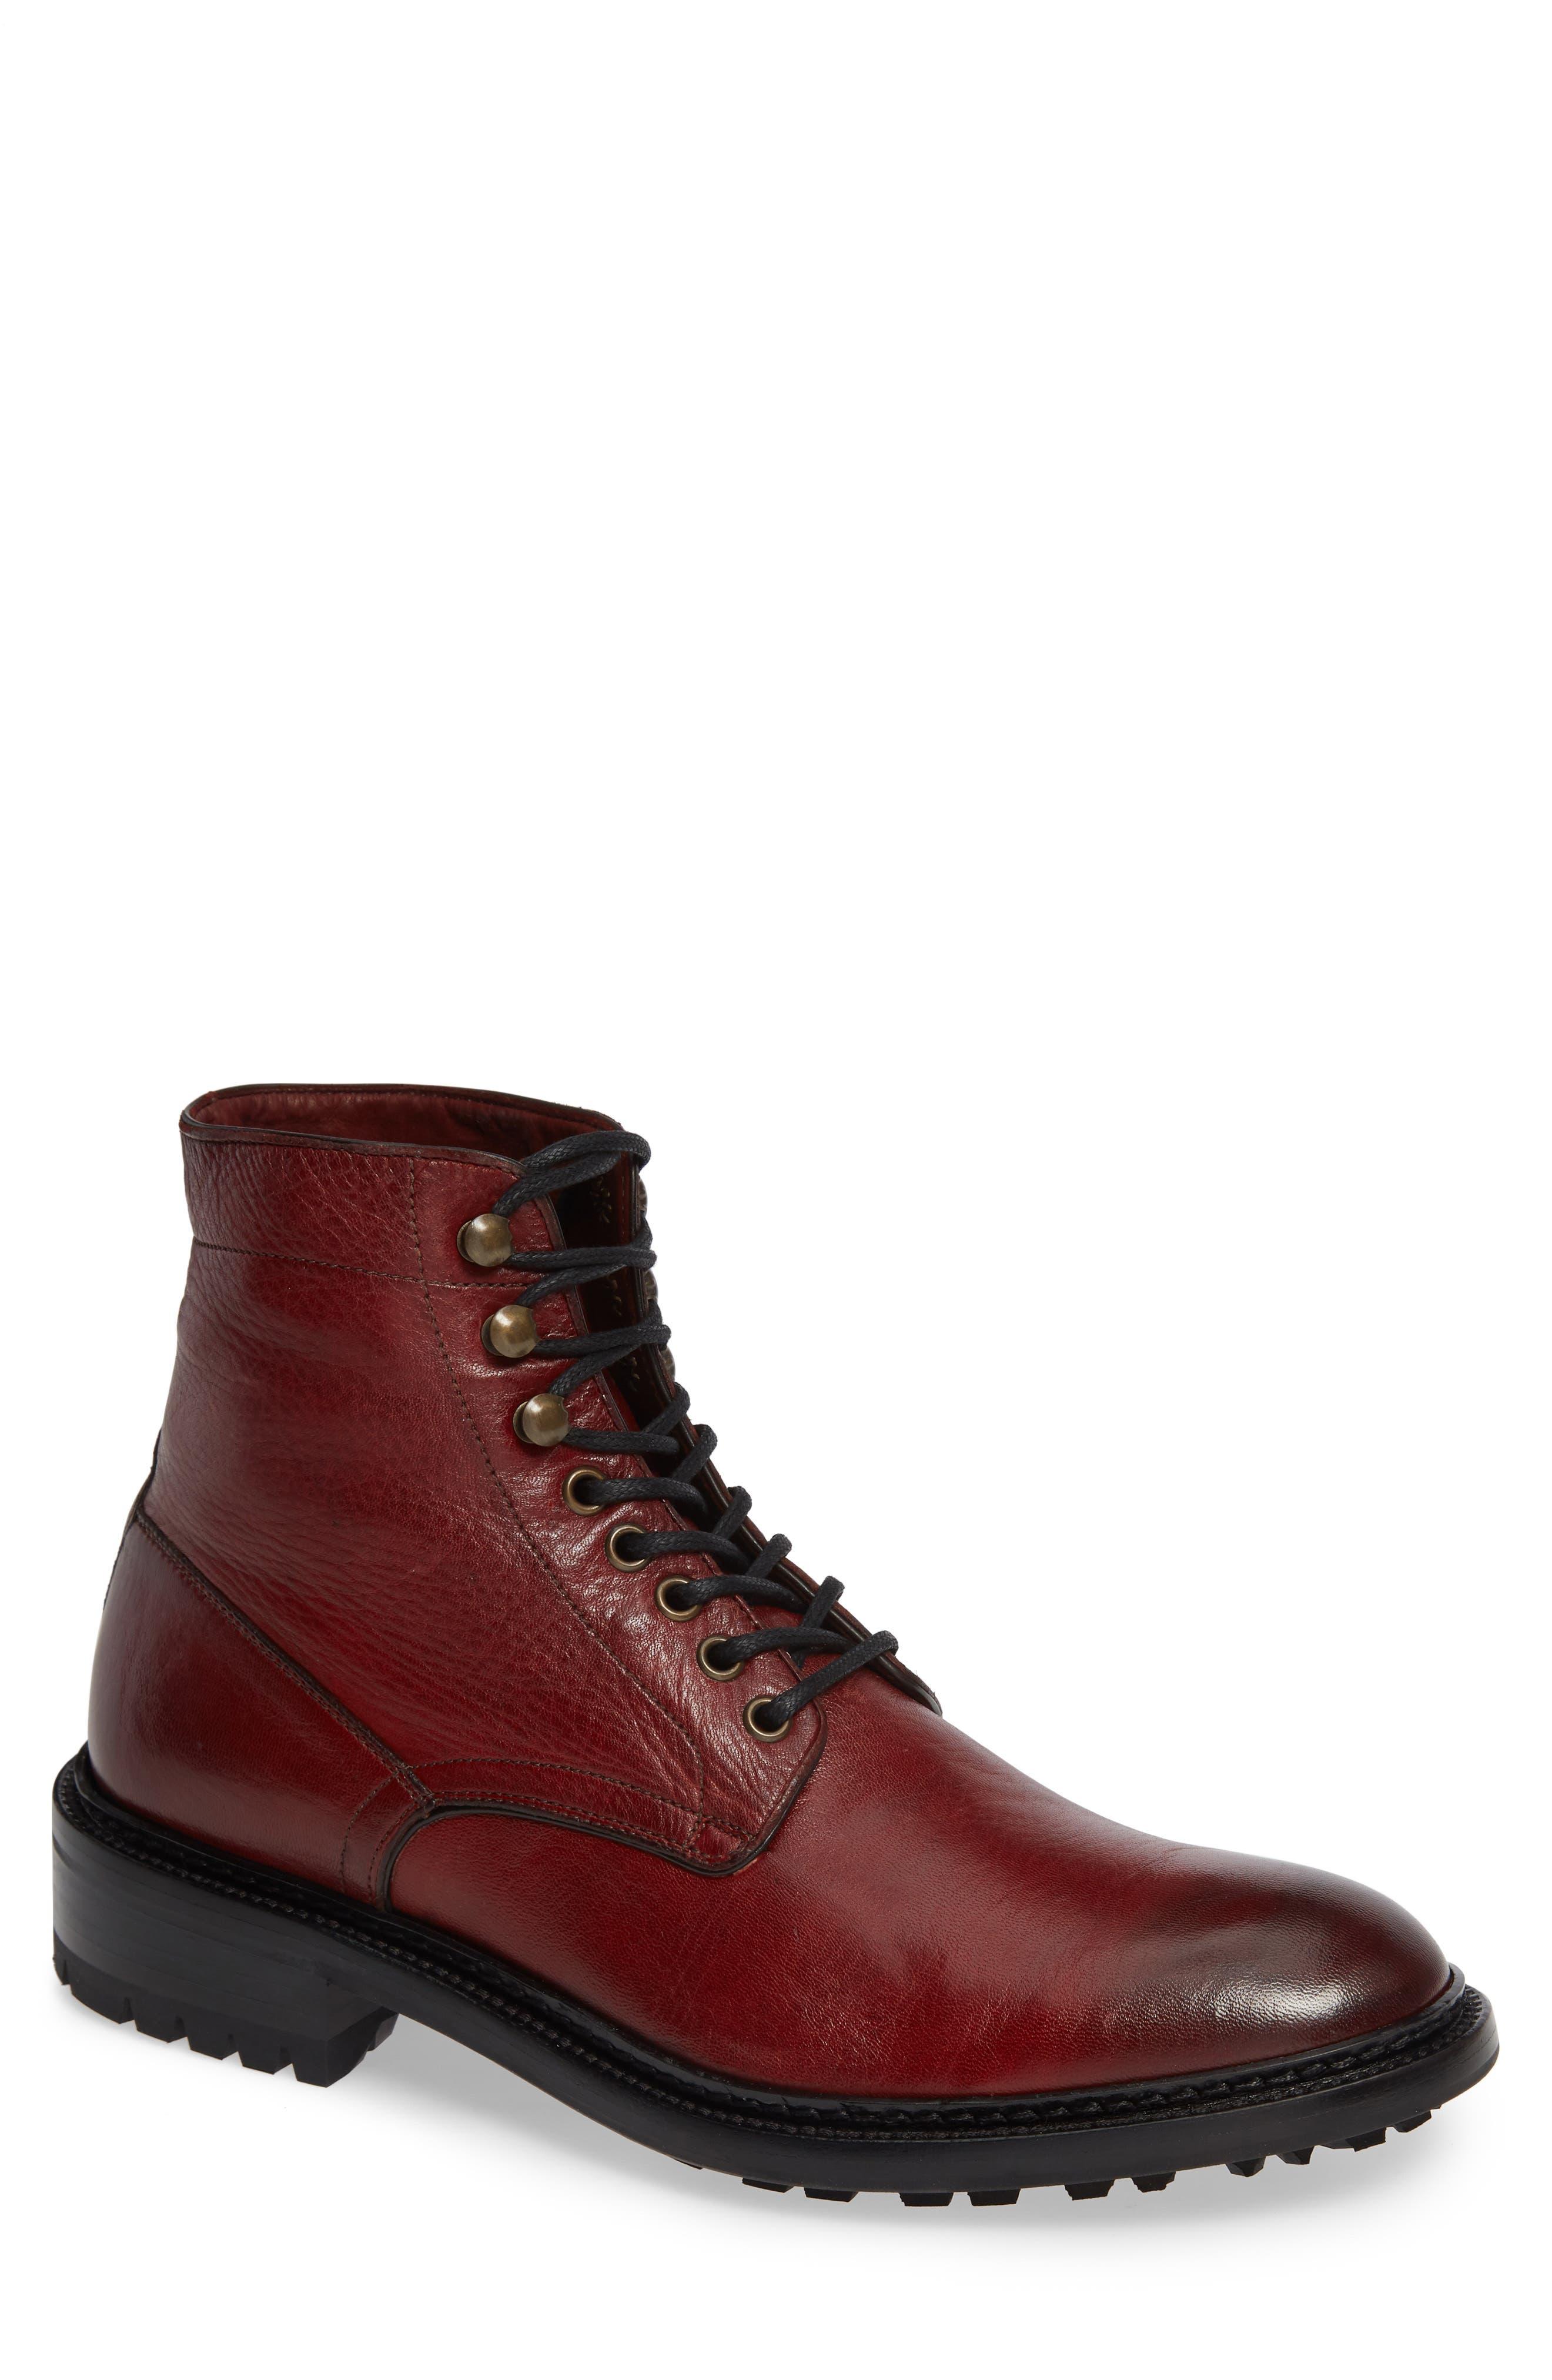 Greyson Plain Toe Boot,                             Main thumbnail 1, color,                             BURGUNDY